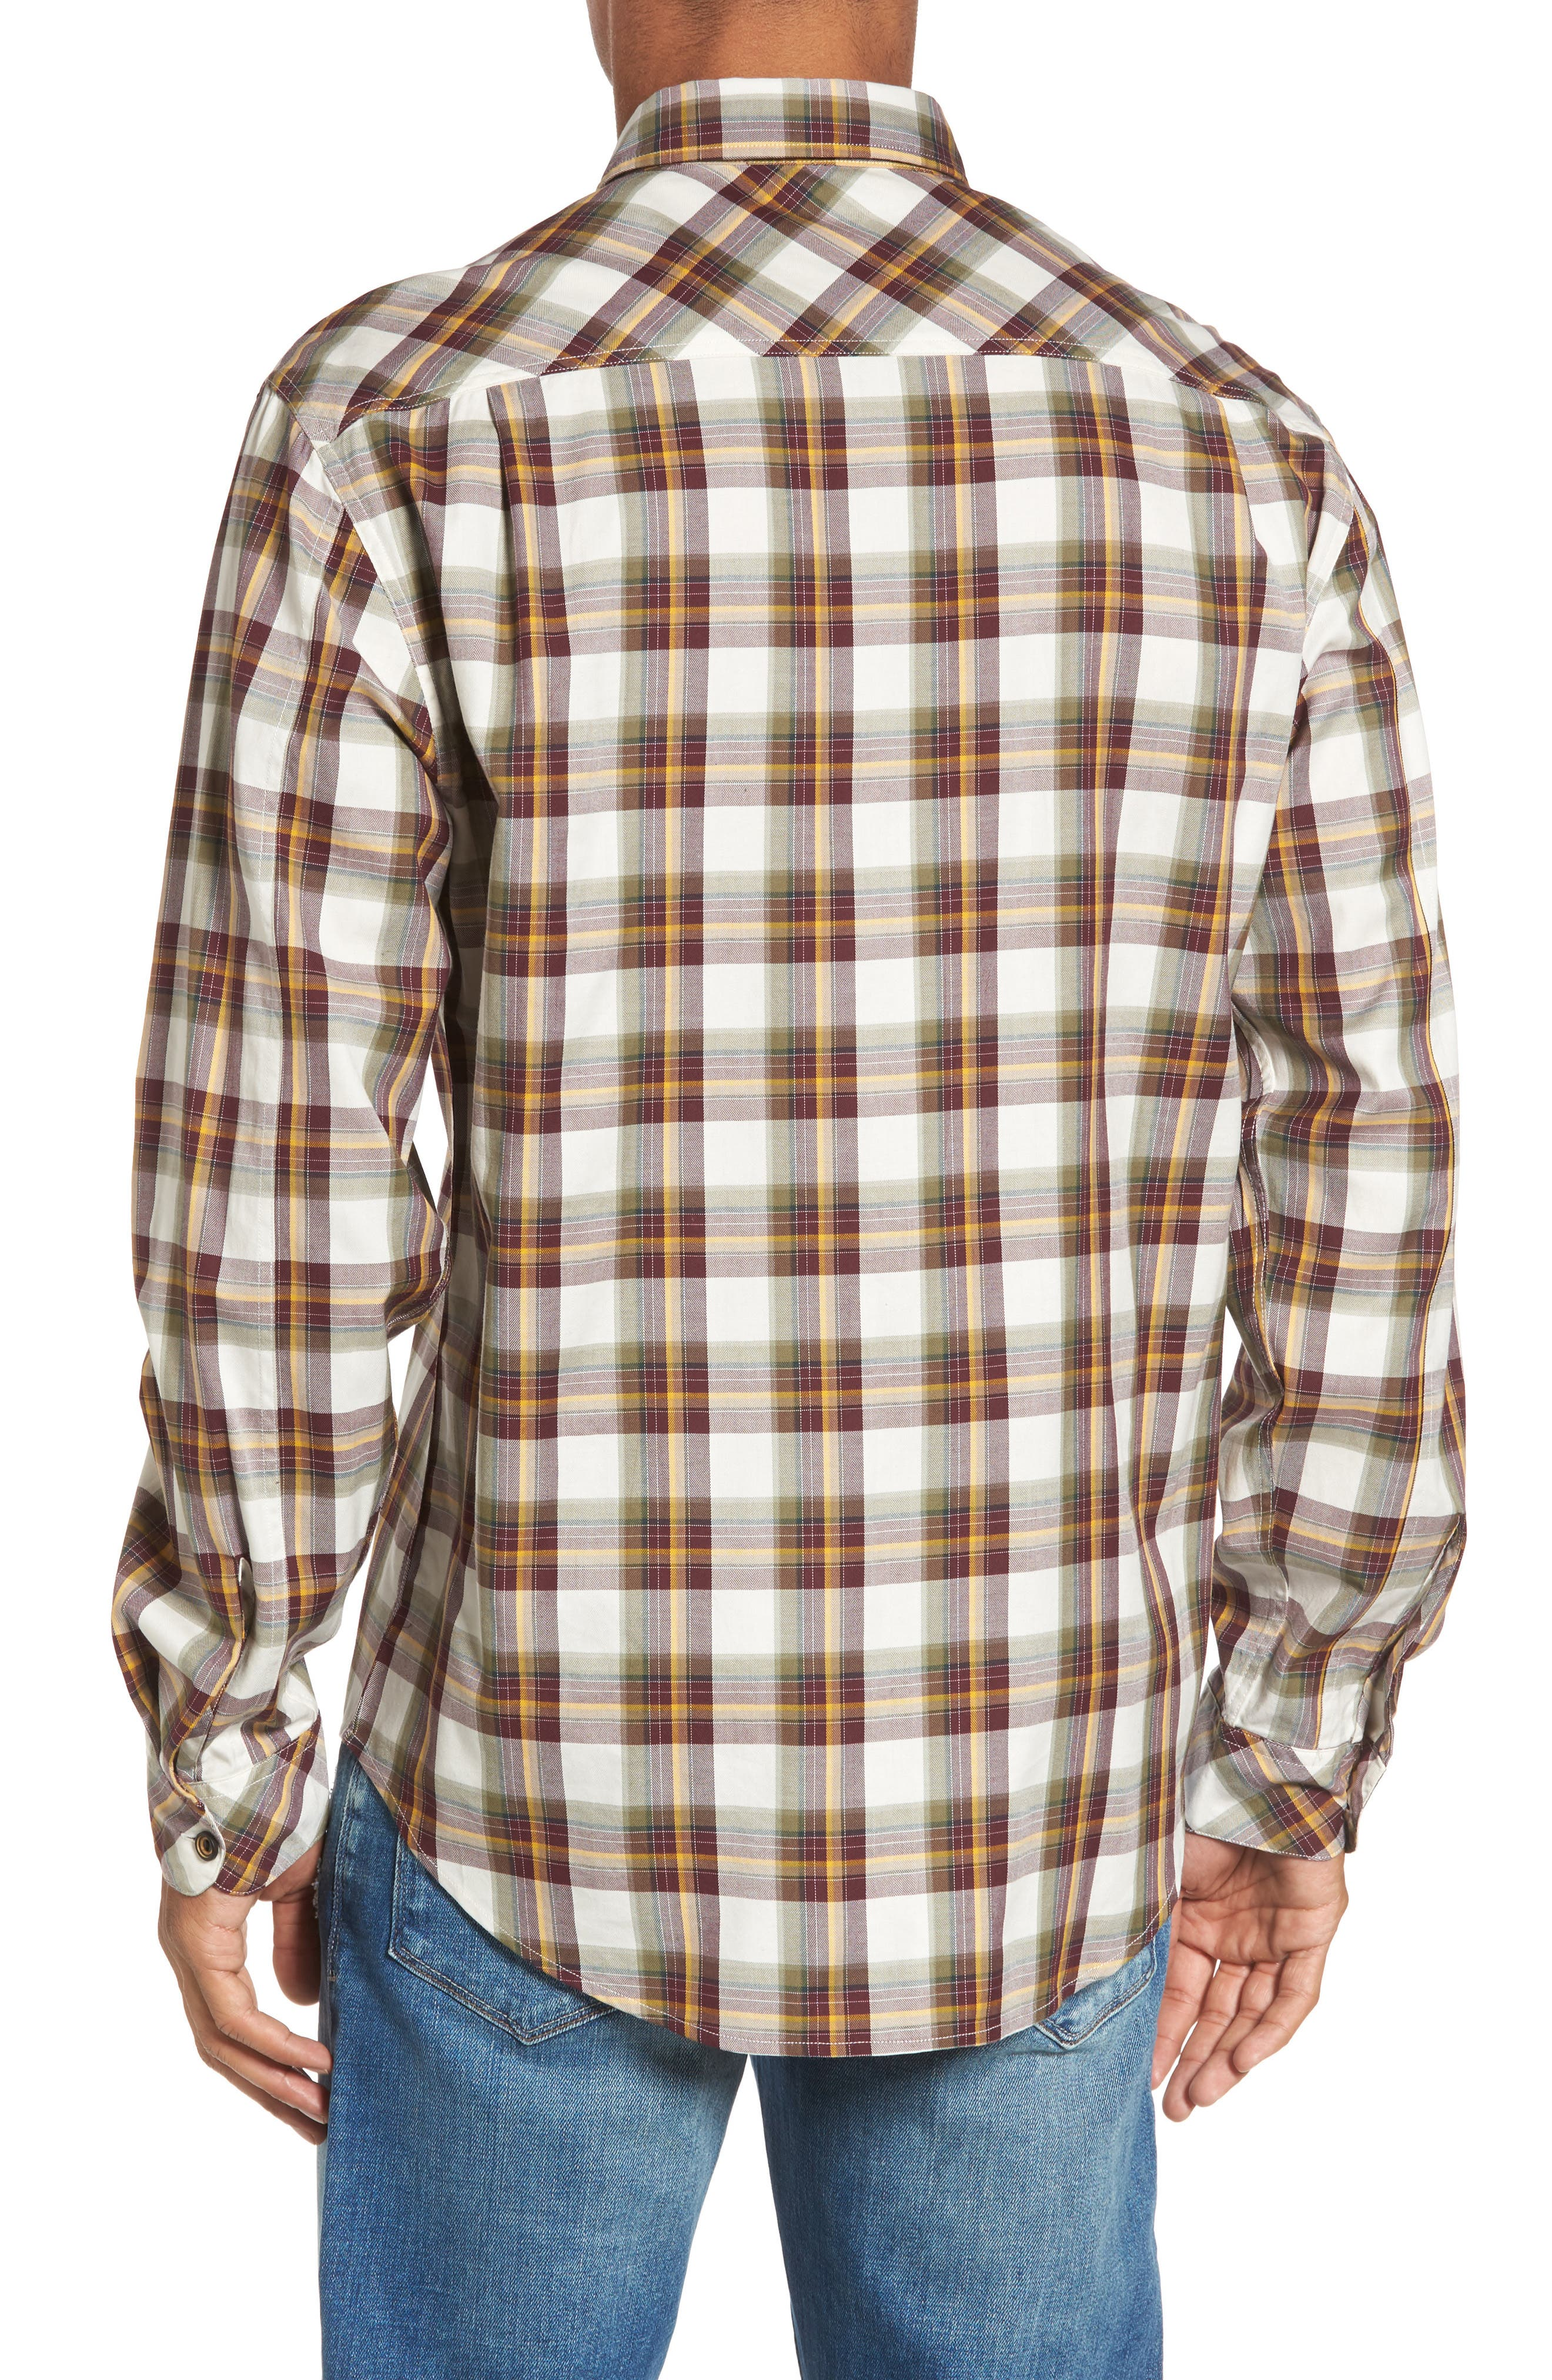 Seacliff Plaid Flannel Shirt,                             Alternate thumbnail 2, color,                             Merlot